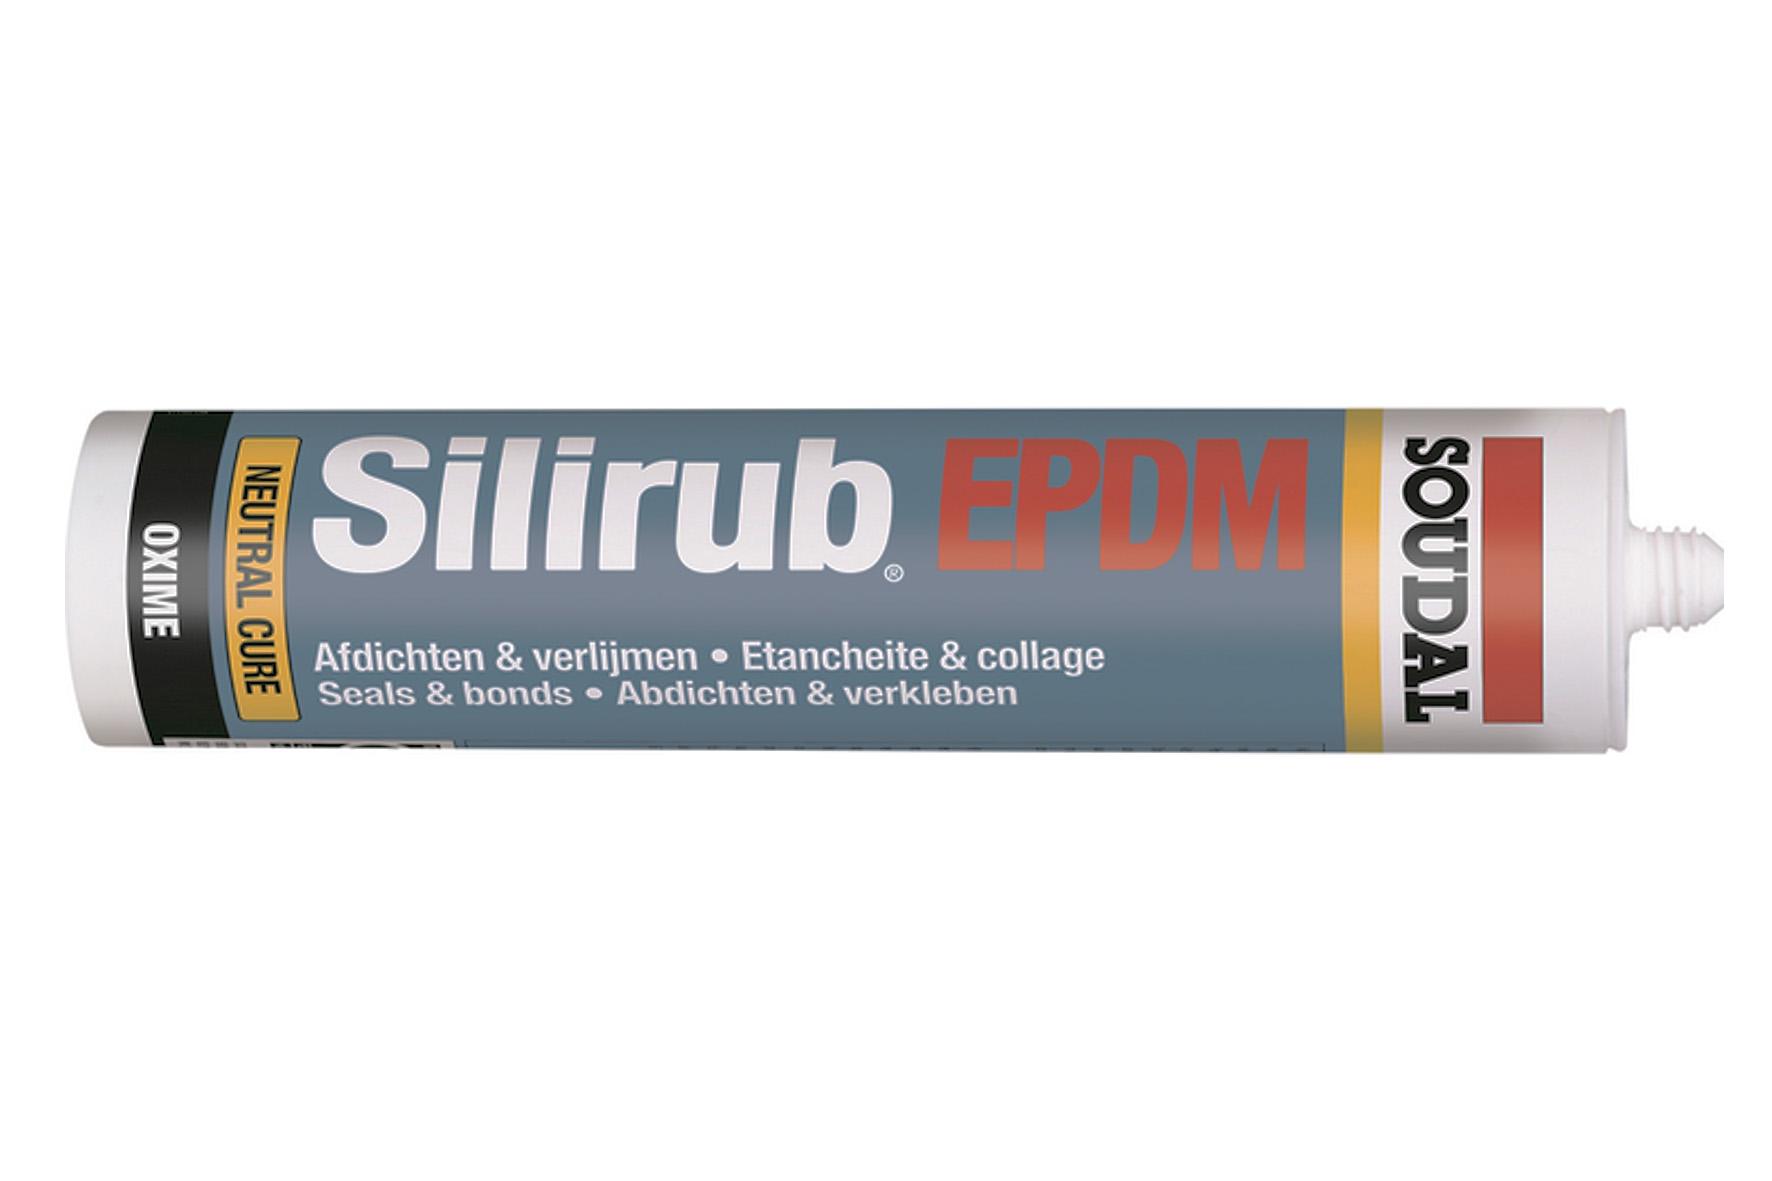 silicone silirub epdm achat en ligne ou dans notre magasin. Black Bedroom Furniture Sets. Home Design Ideas